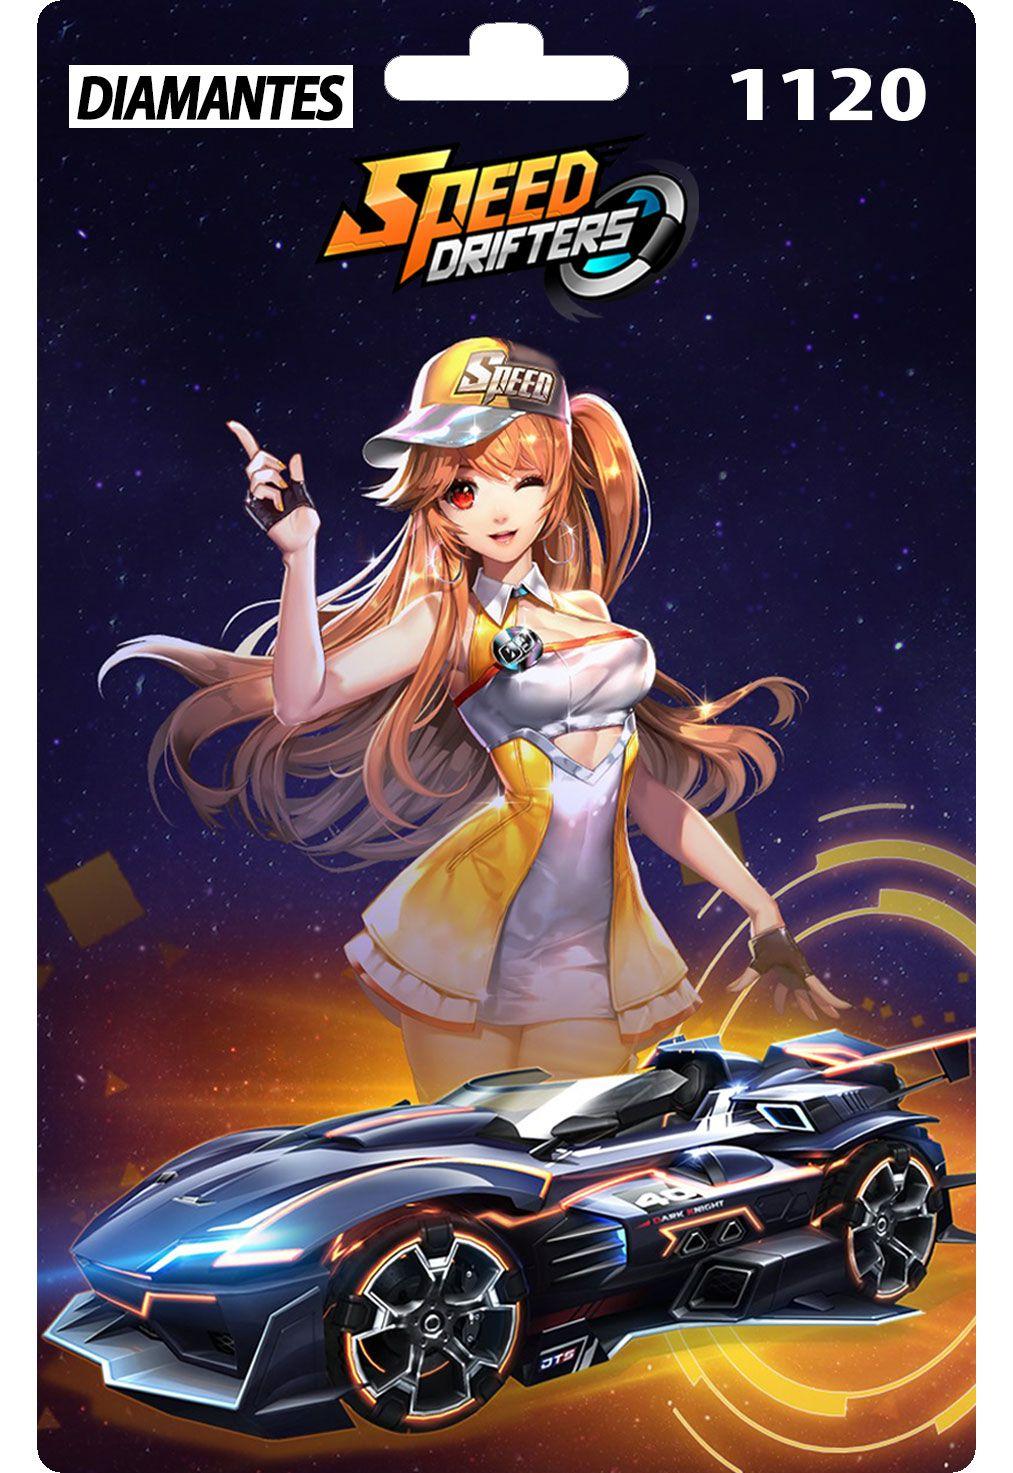 Speed Drifters 1120 Diamantes Recarga Zero3games